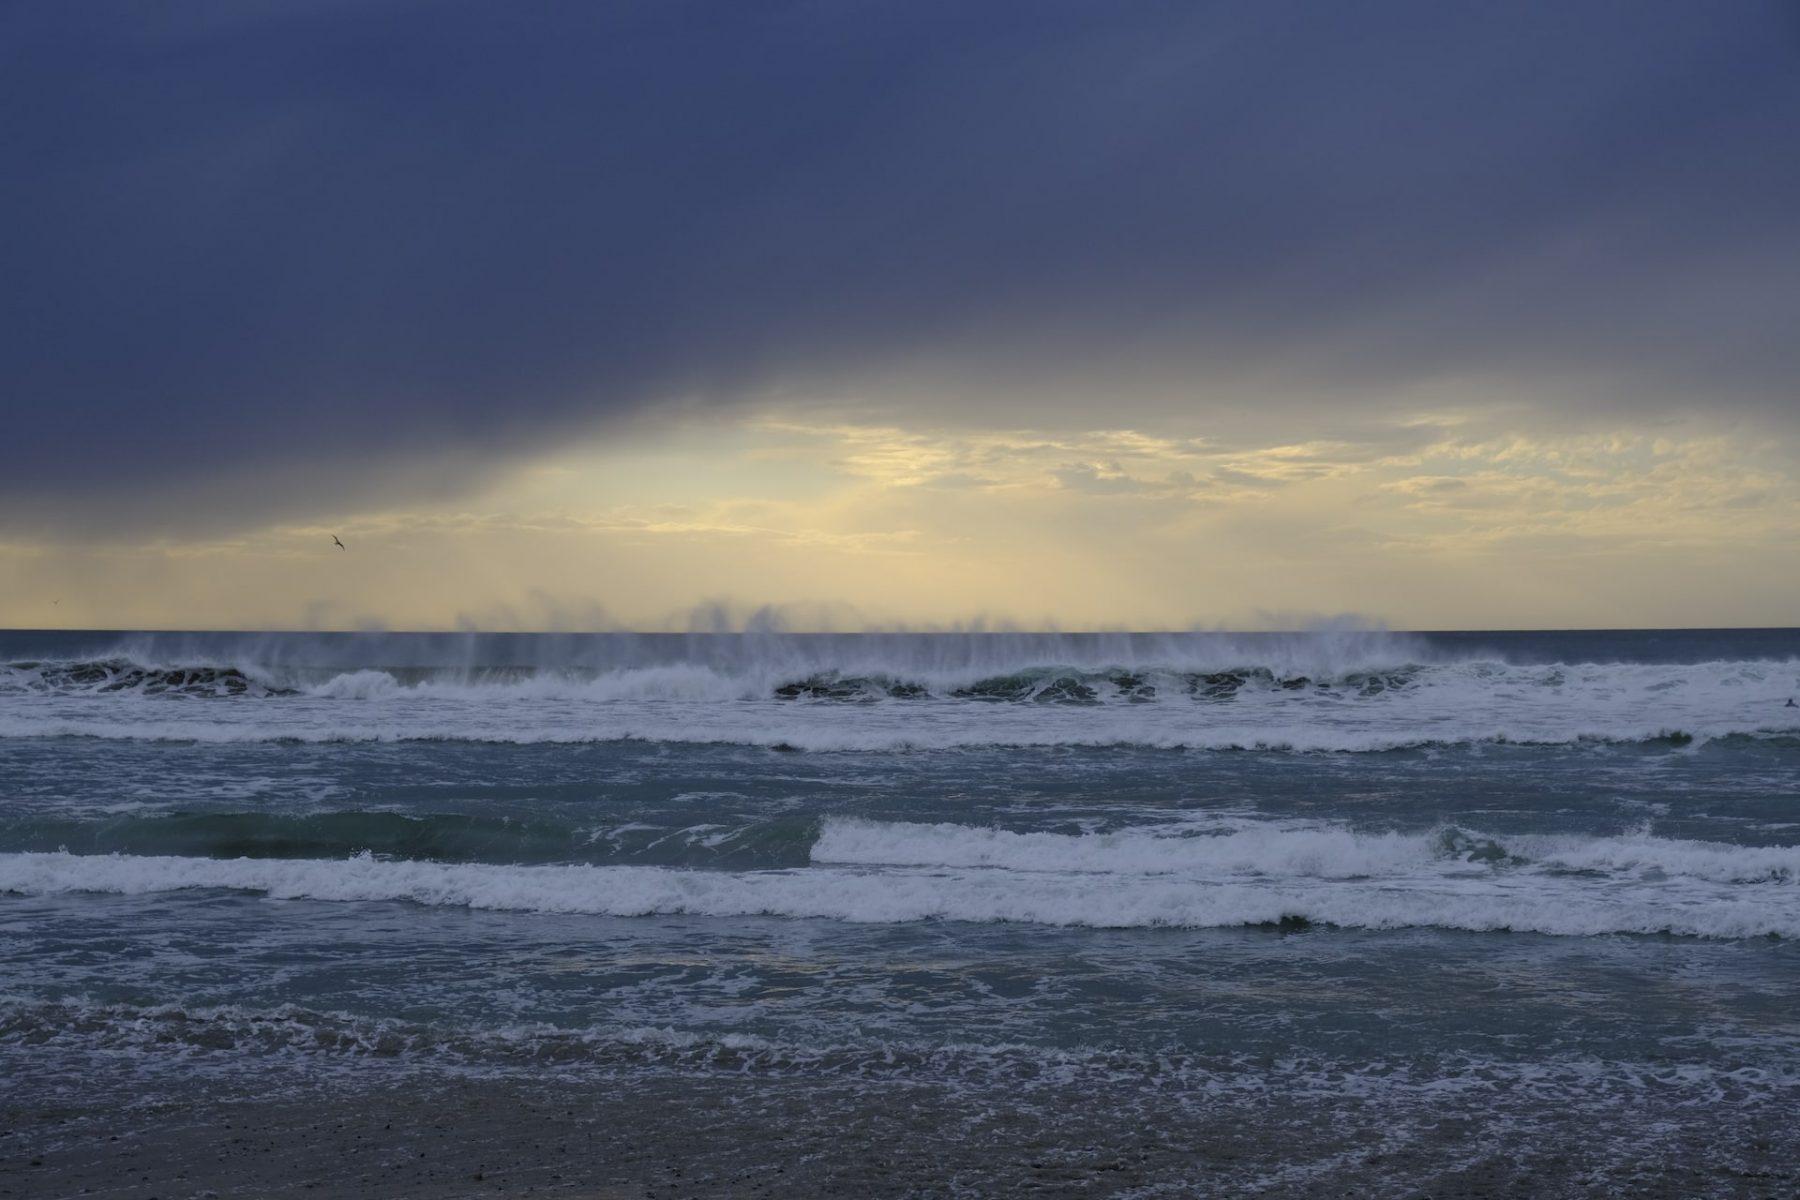 Erica Miller - Wind, Rain, Sea Spray